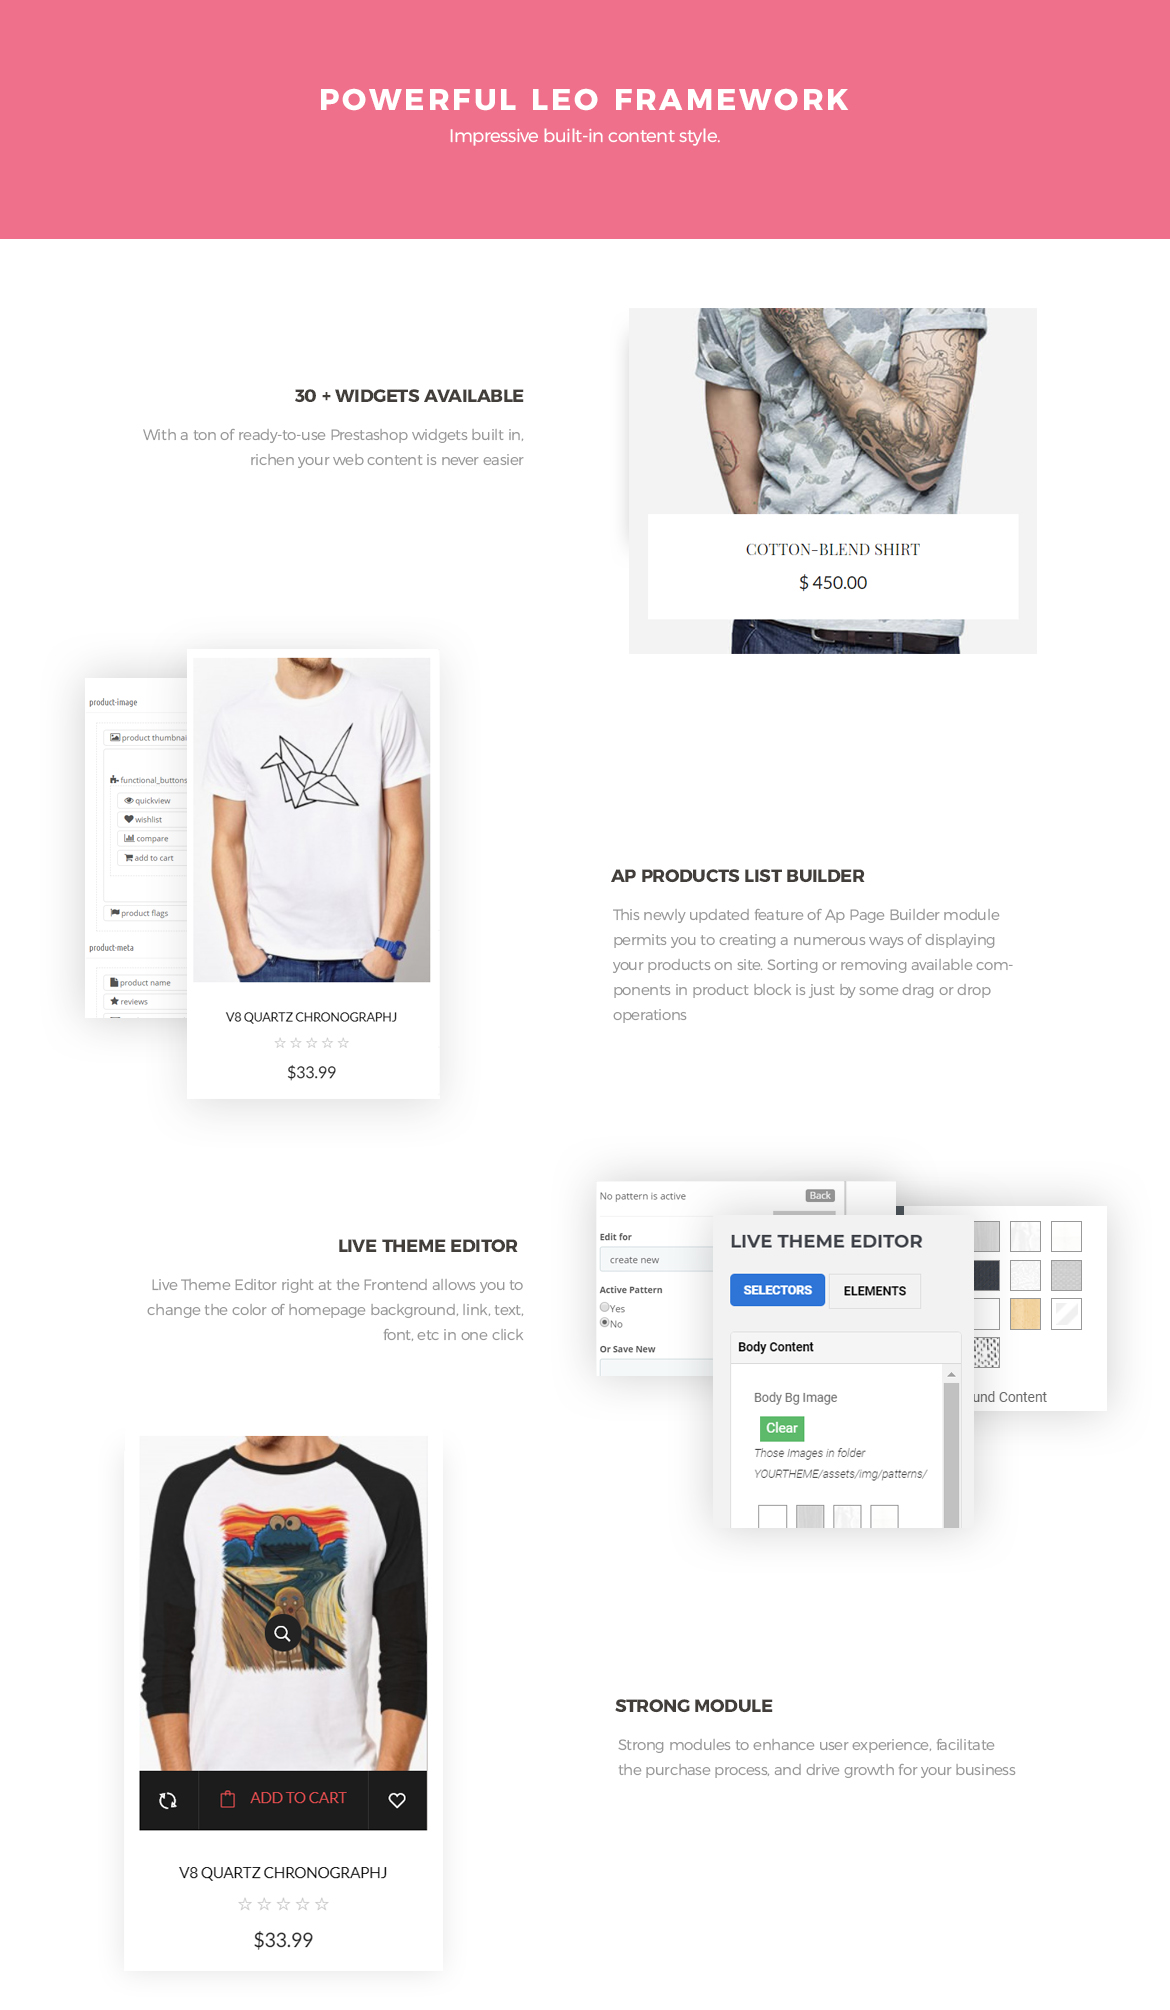 Powerful-Leo-Framework - Leo Chic - Women Fashion and Lingerie Store